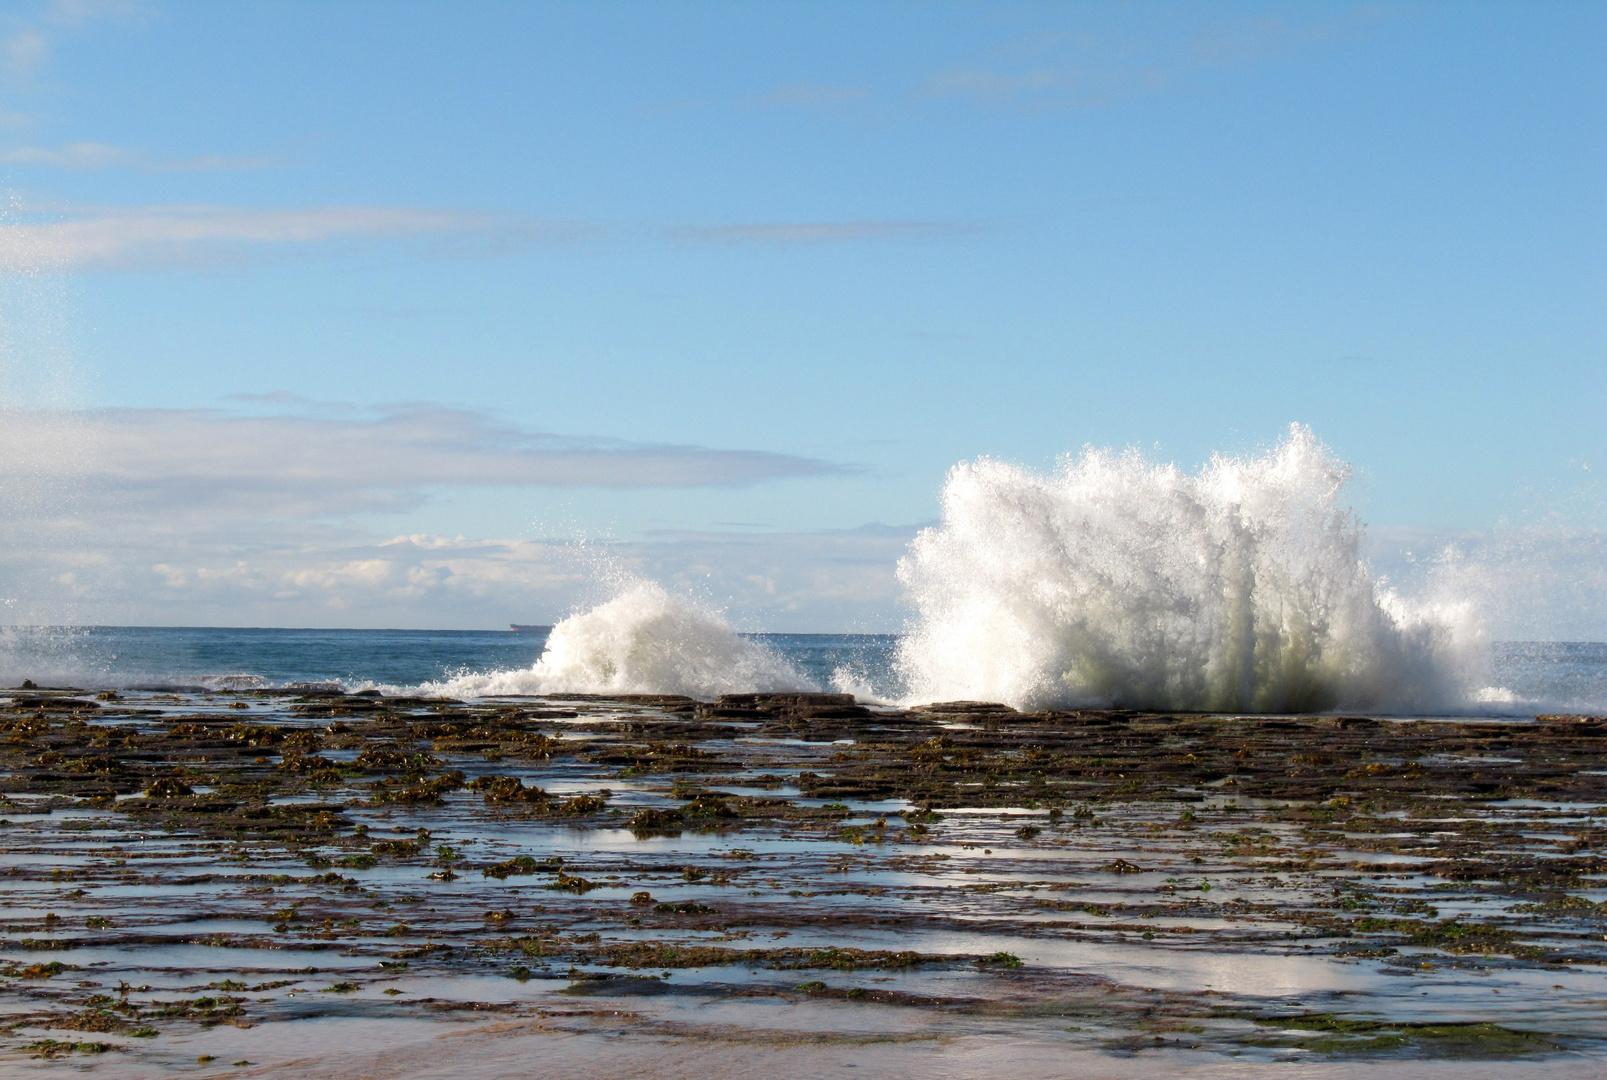 Illawara Coast - Australien (NSW)